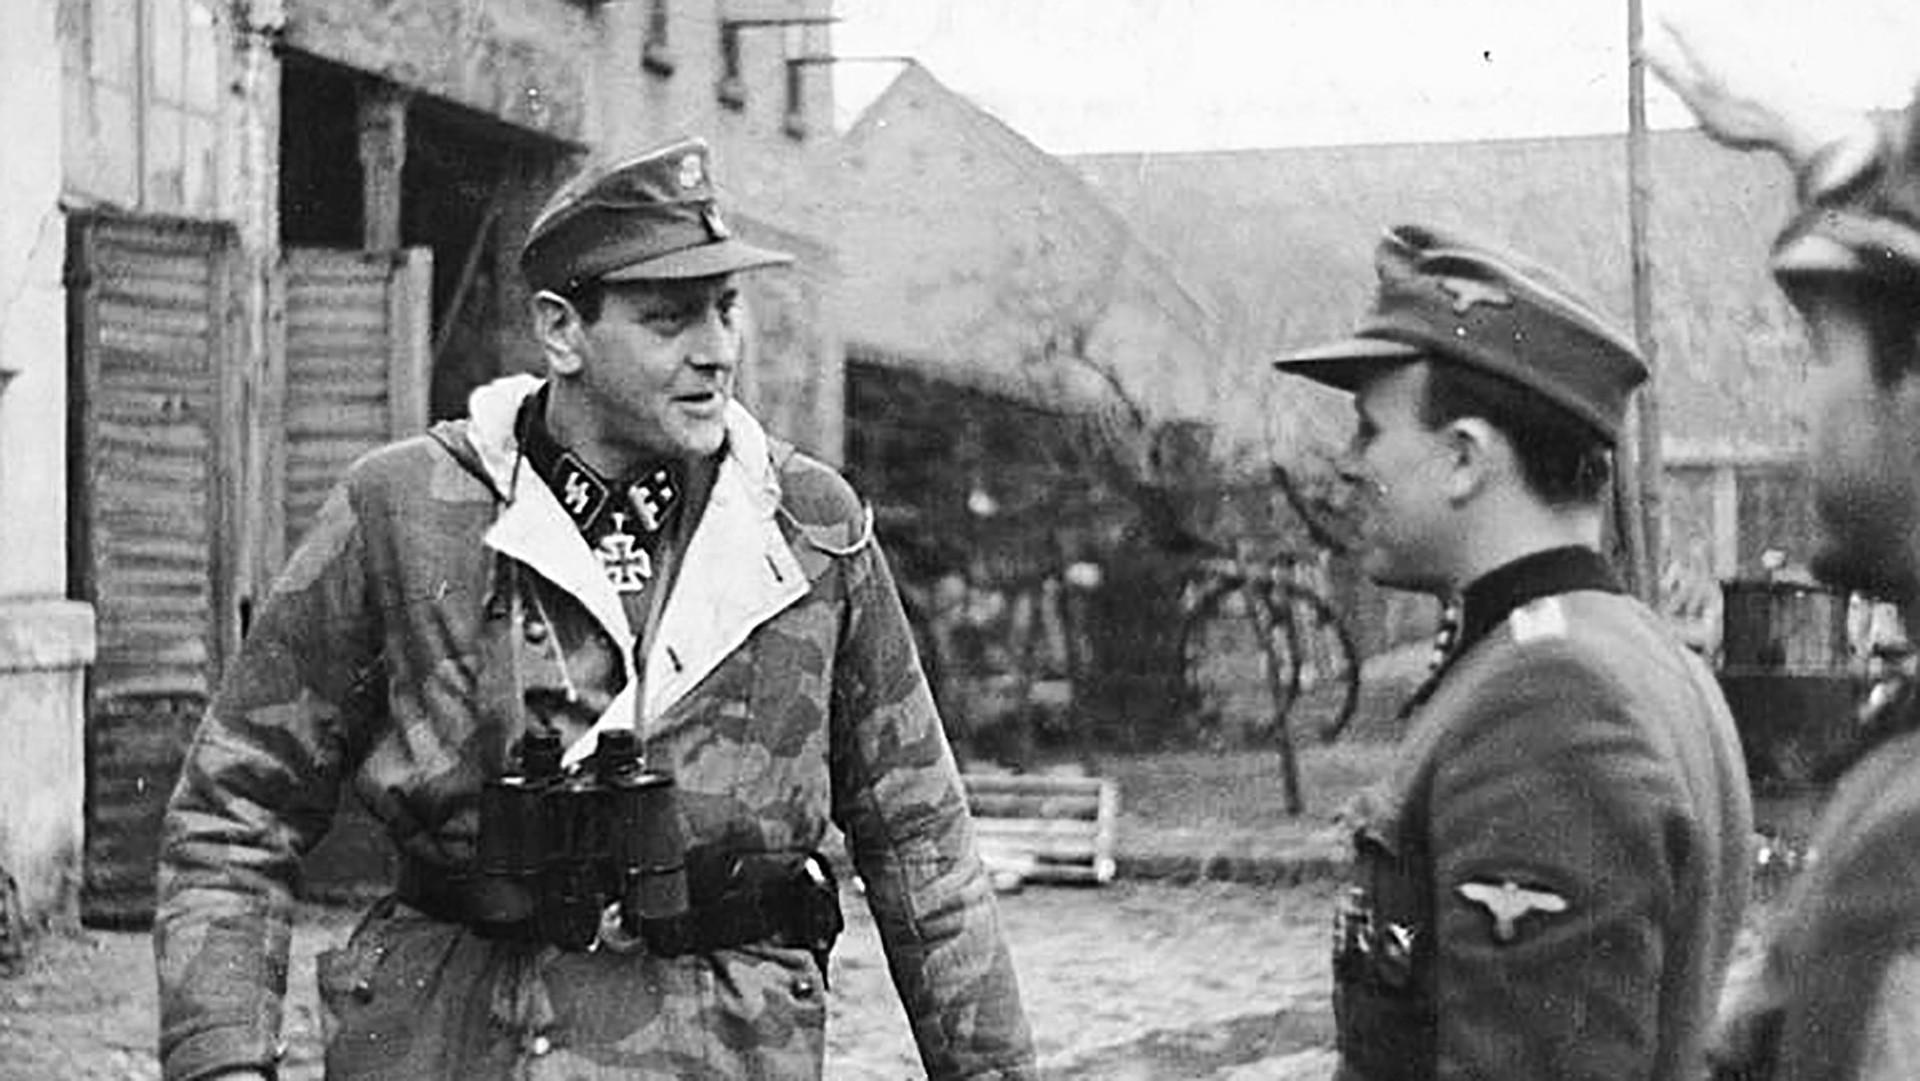 Obersturmbannführer Otto Skorzeny.